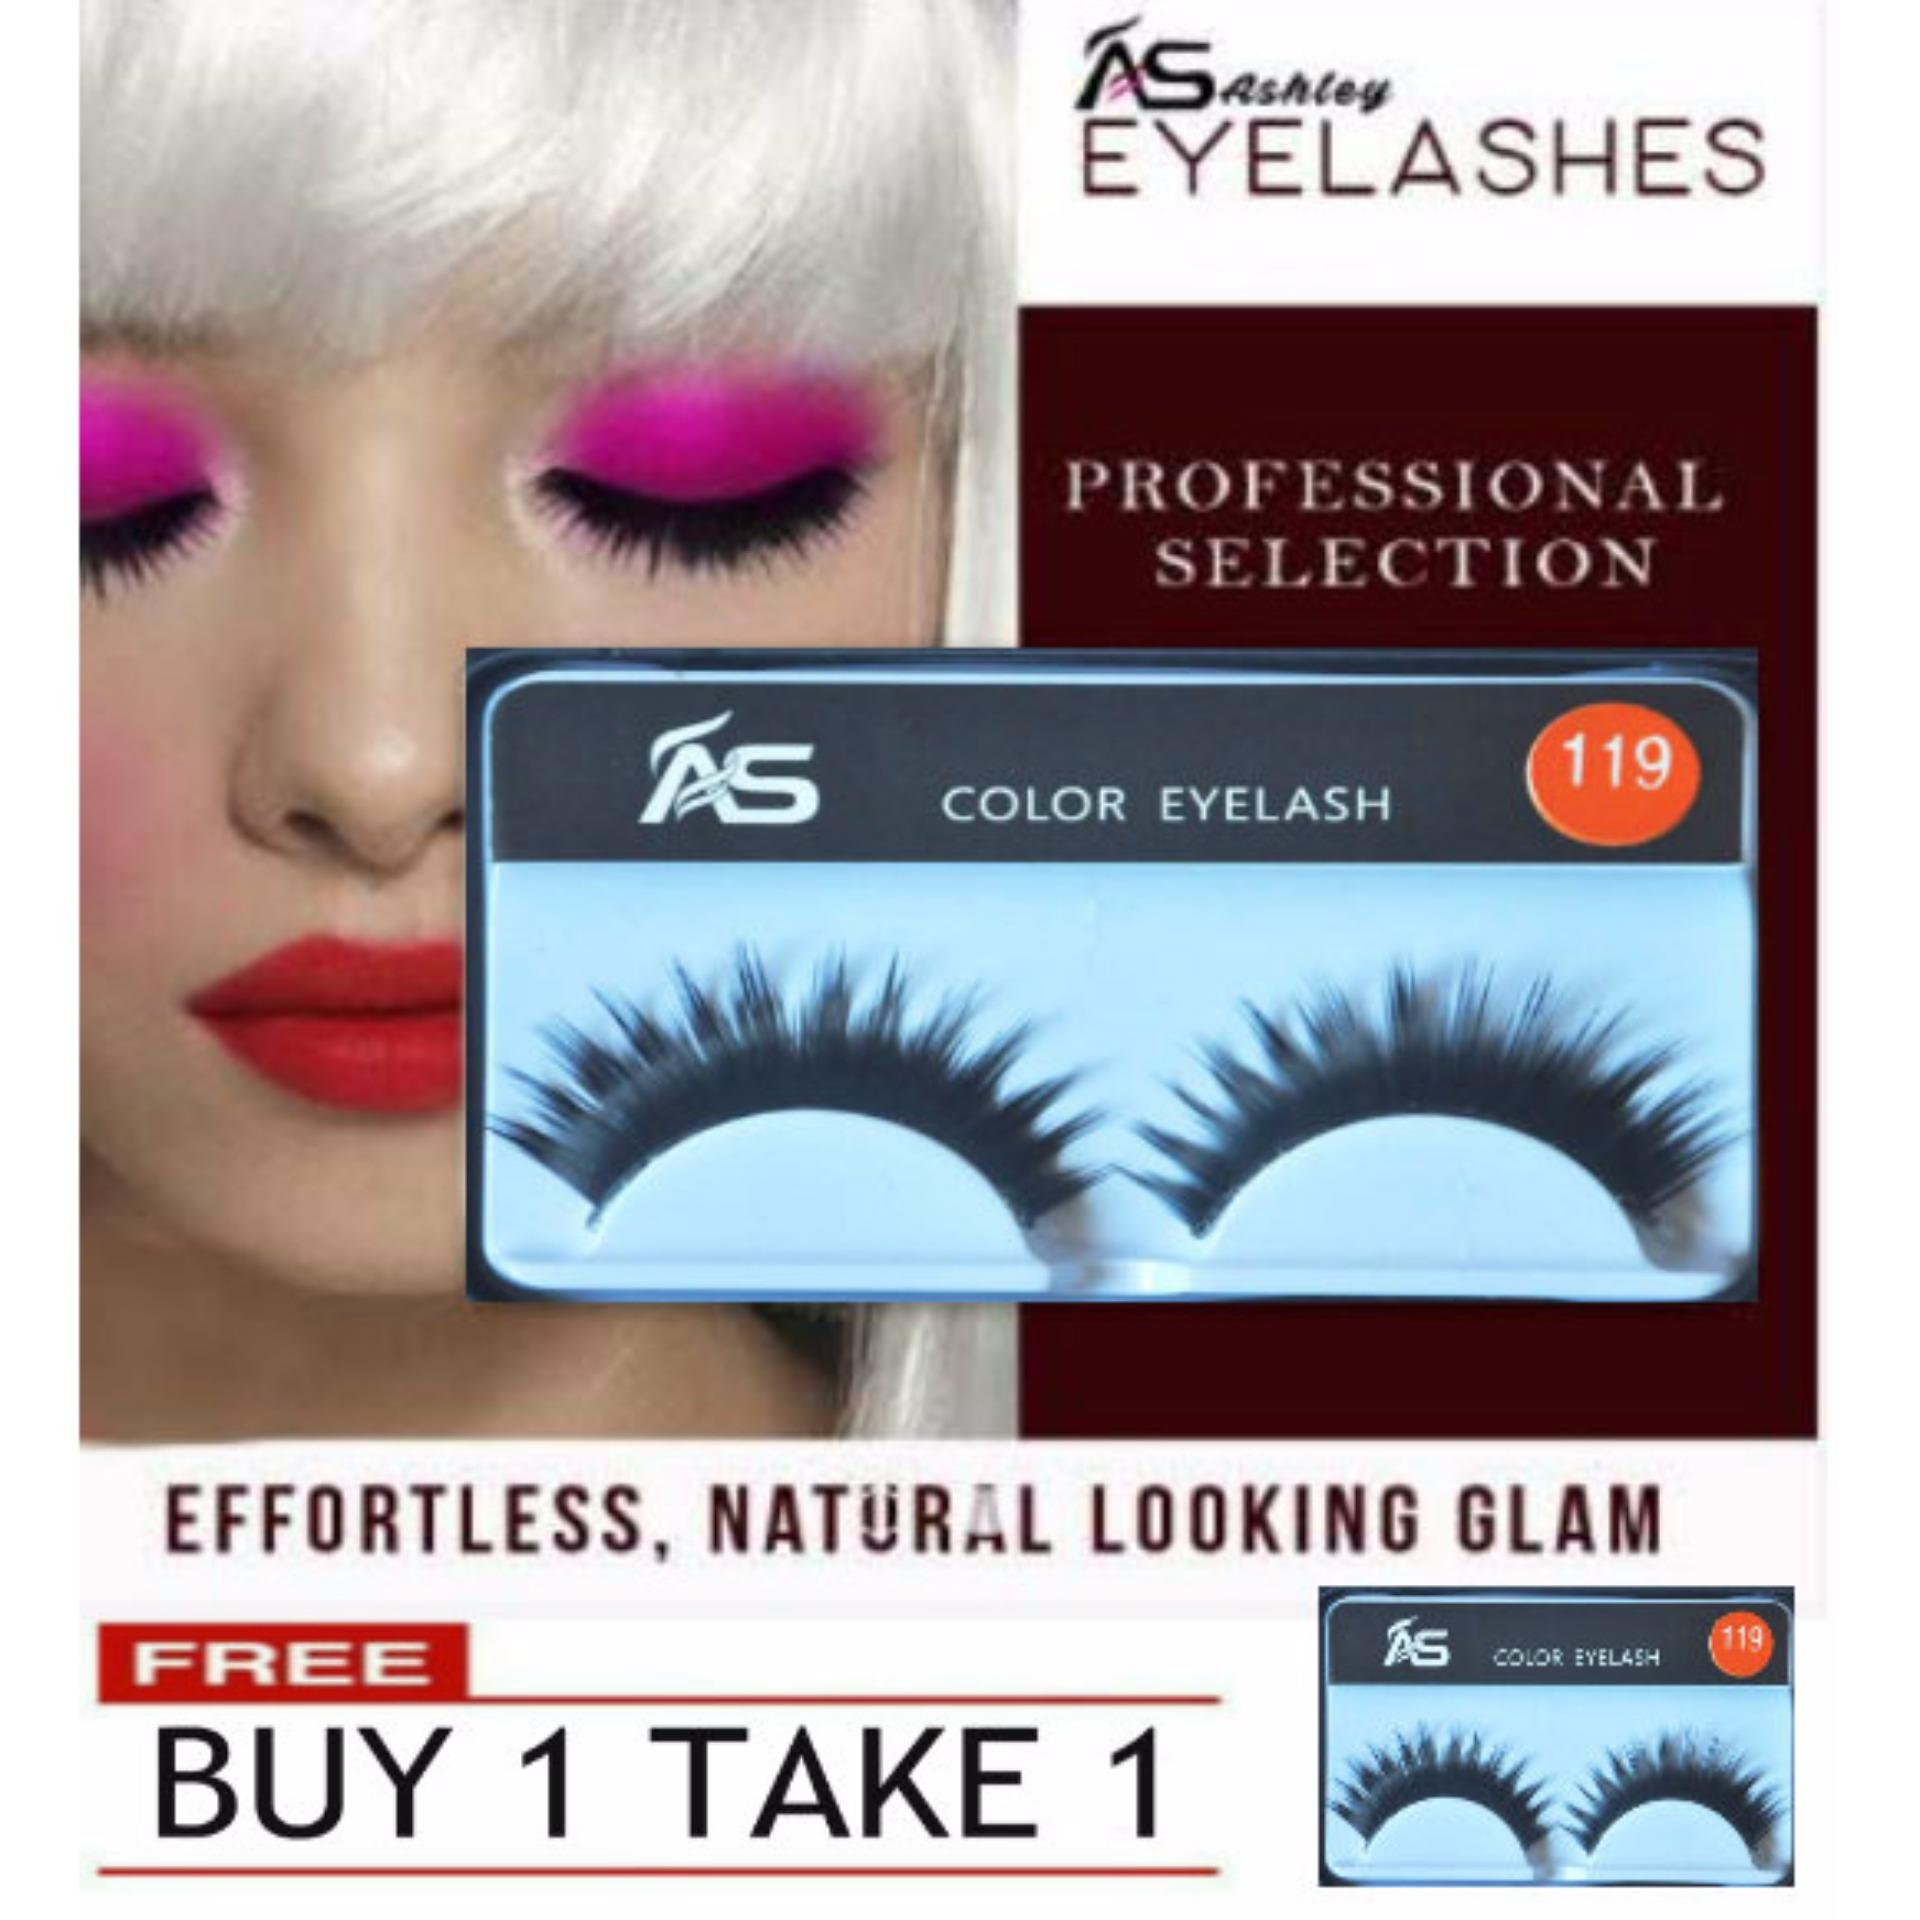 1 Pair Ashley Shine Full Volume False Eyelashes 119 Buy 1 Take 1